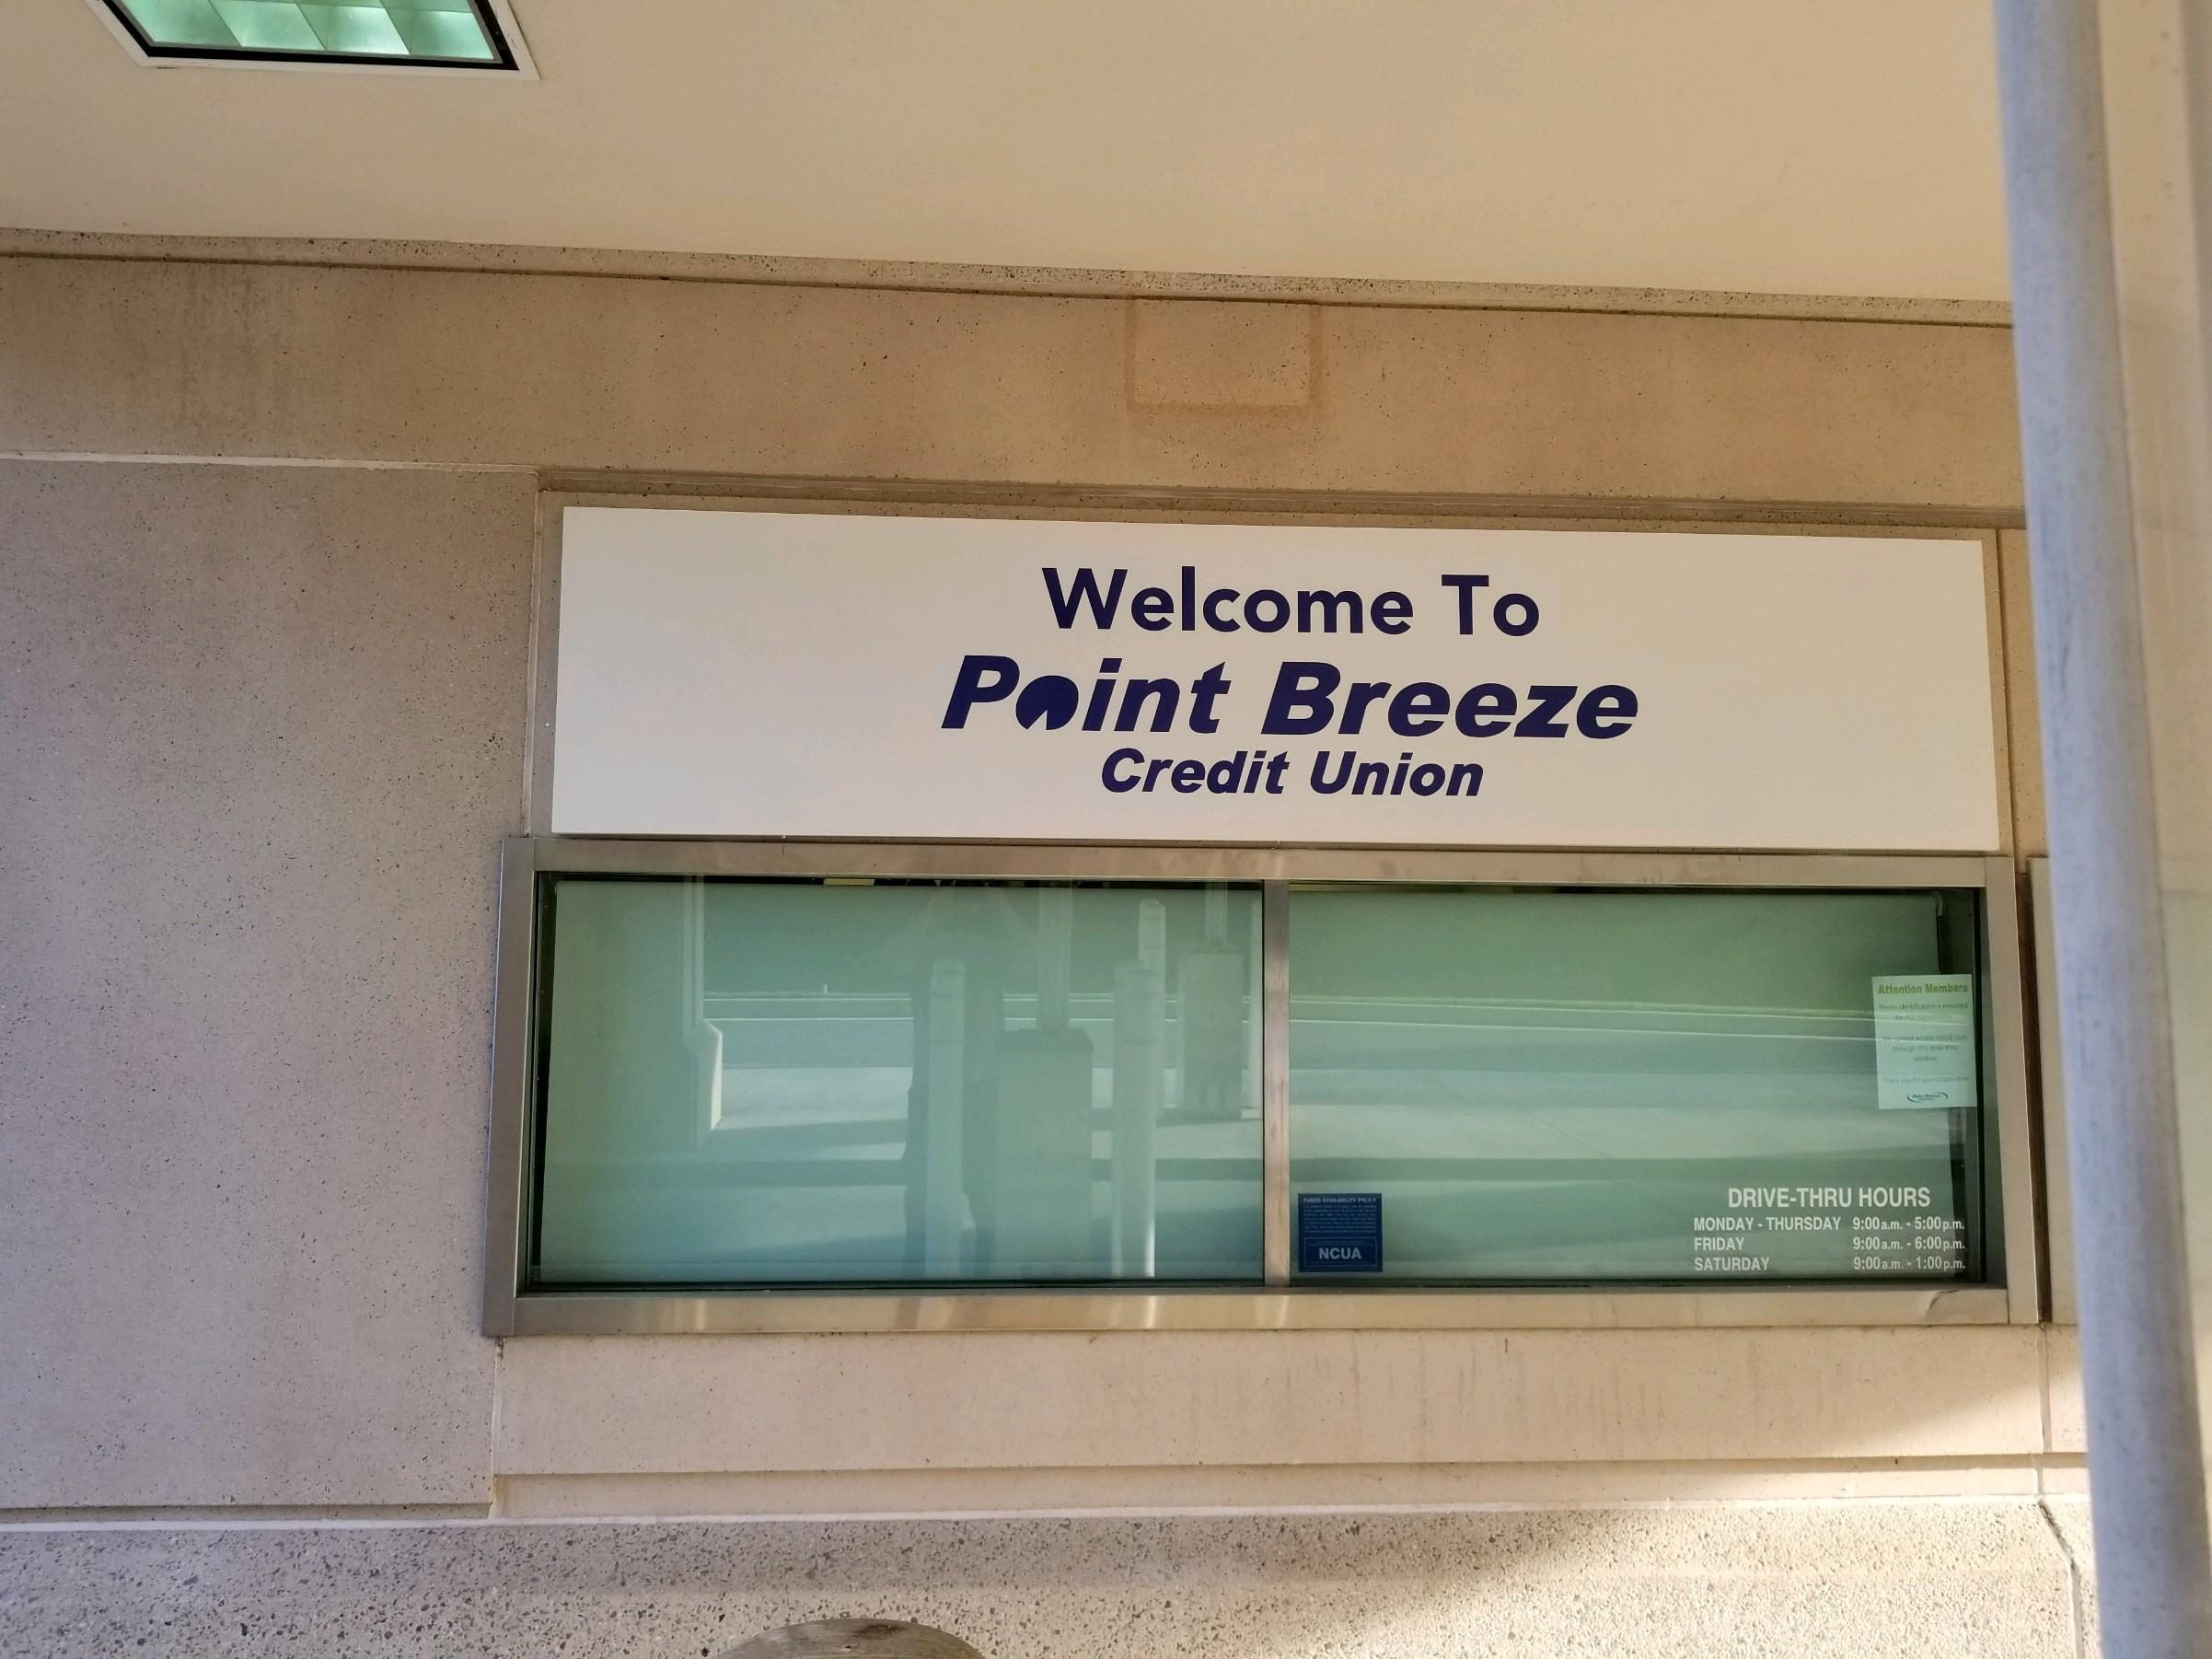 Pointi Breeze Credit Union Banner